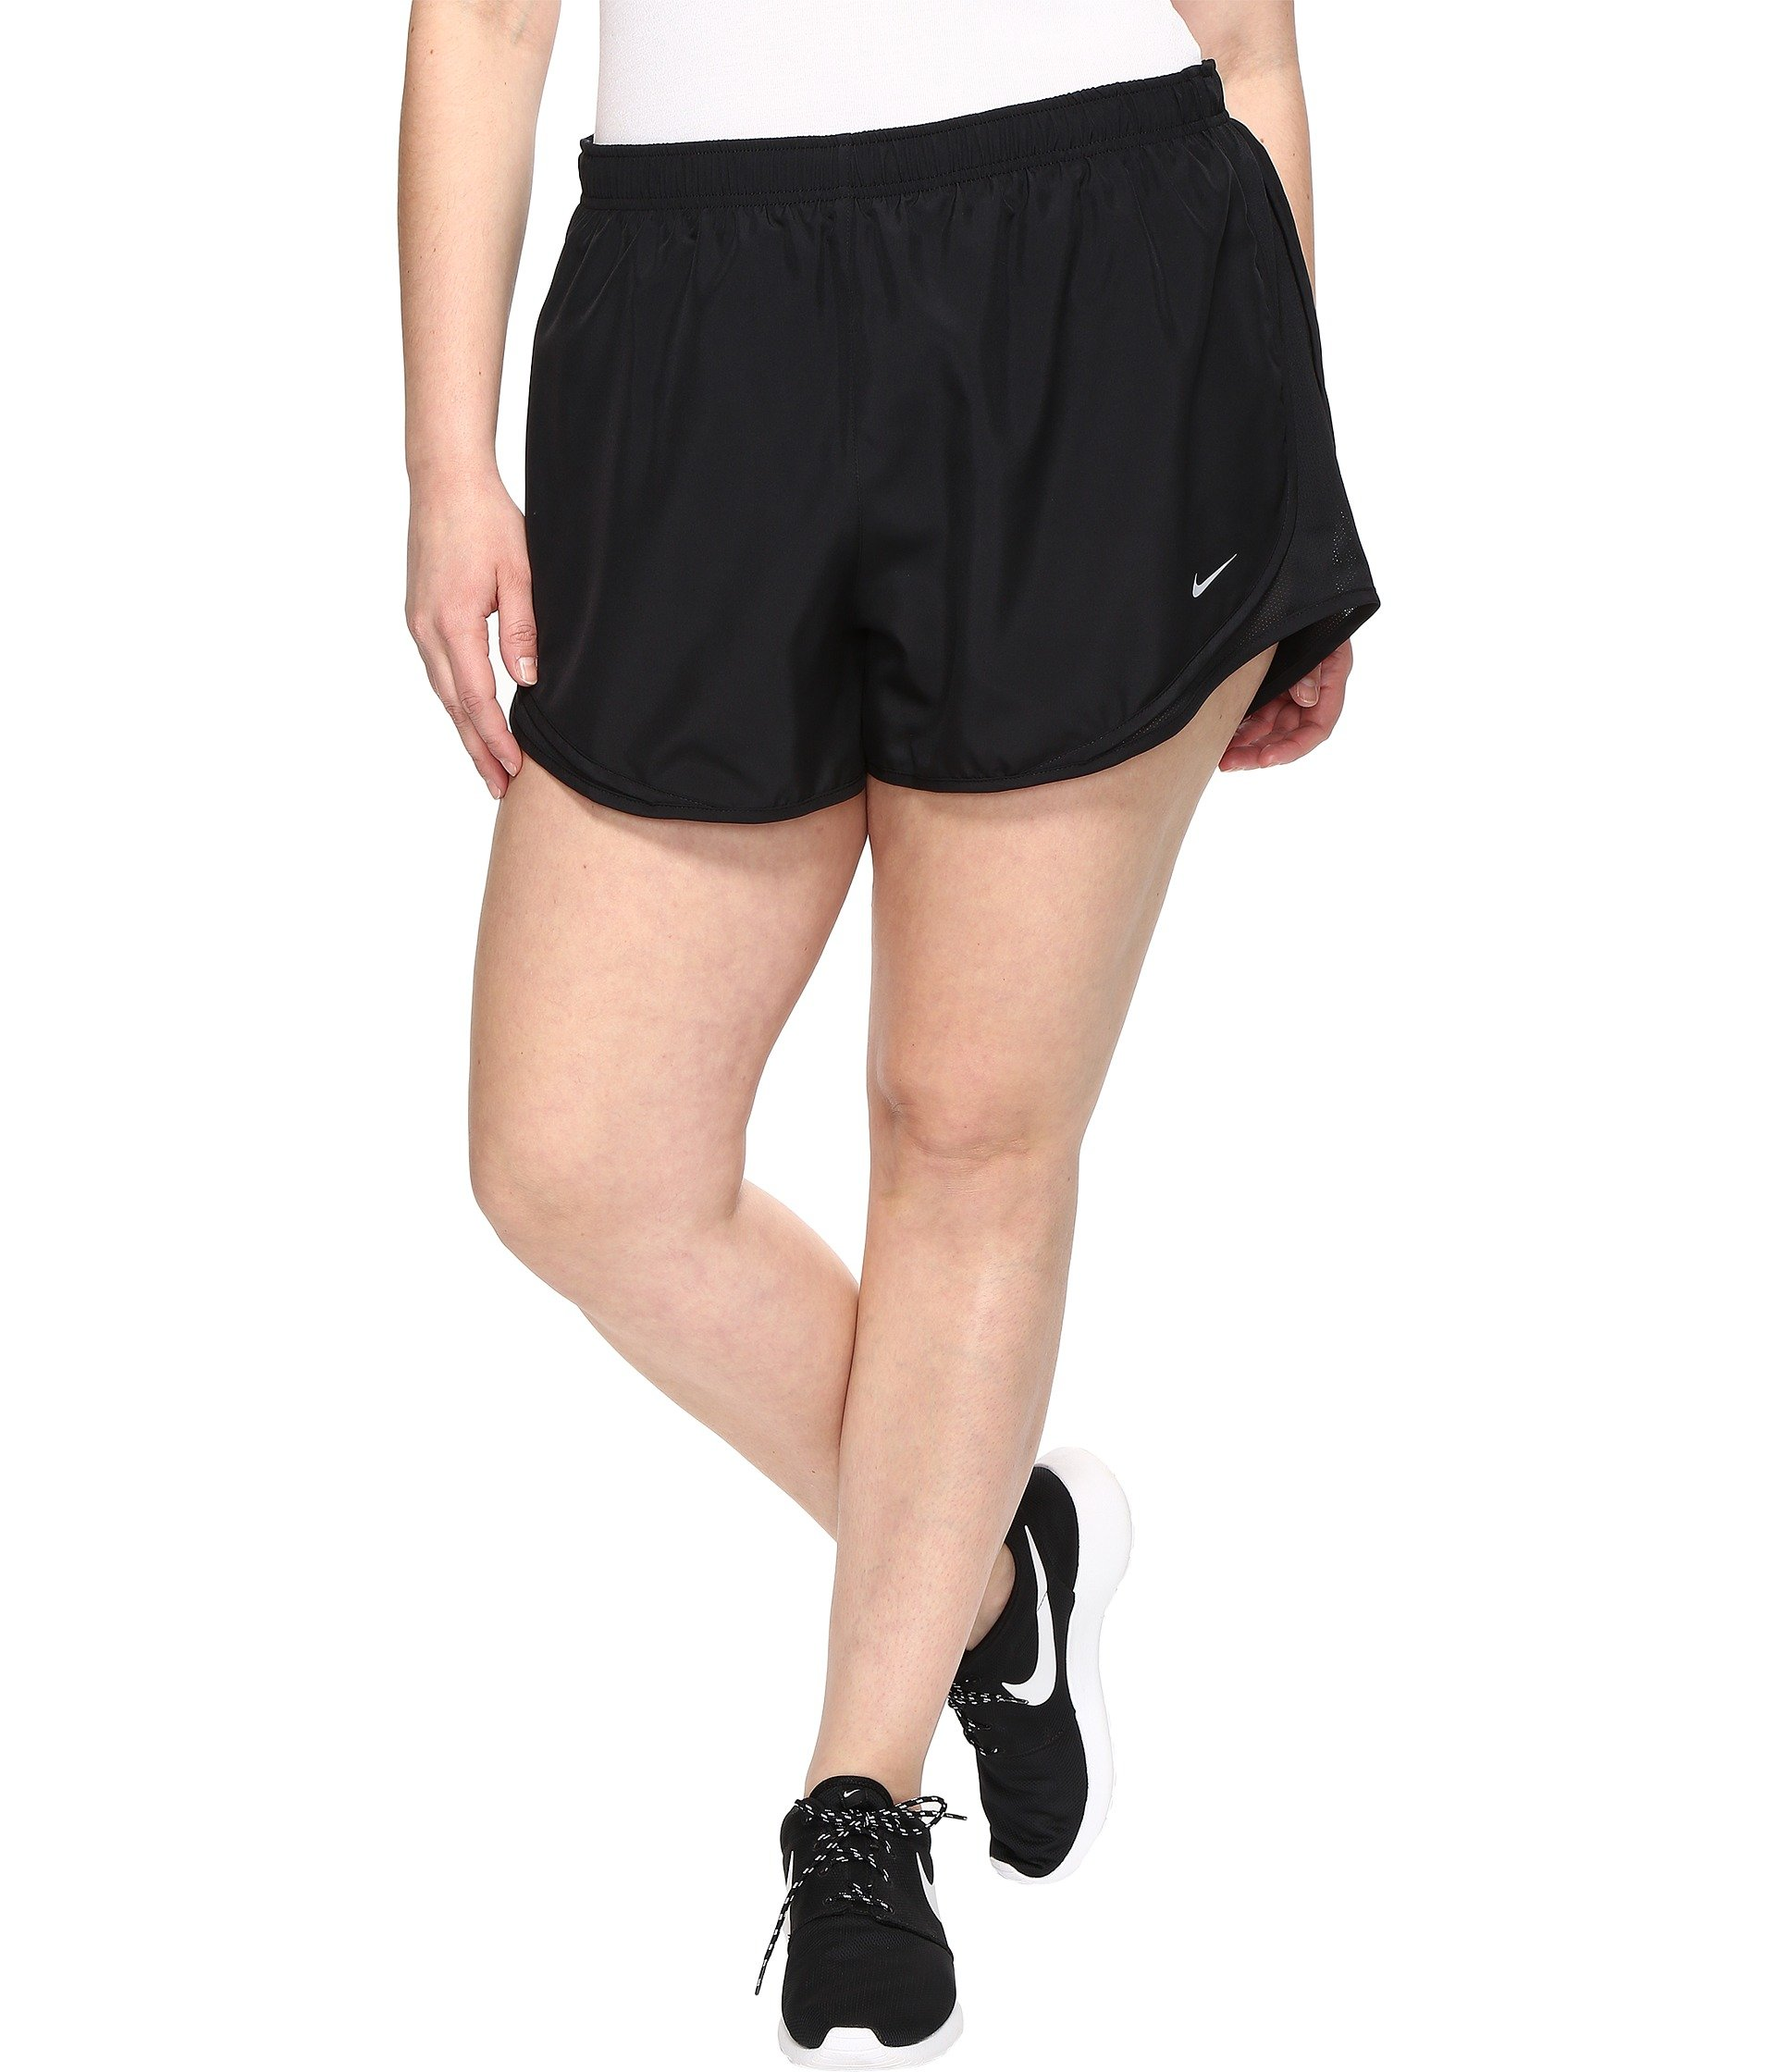 Nike Dry Tempo 3 Running Short Size 1X-3X Black/Black/Black/Wolf Grey Women's Shorts by Nike